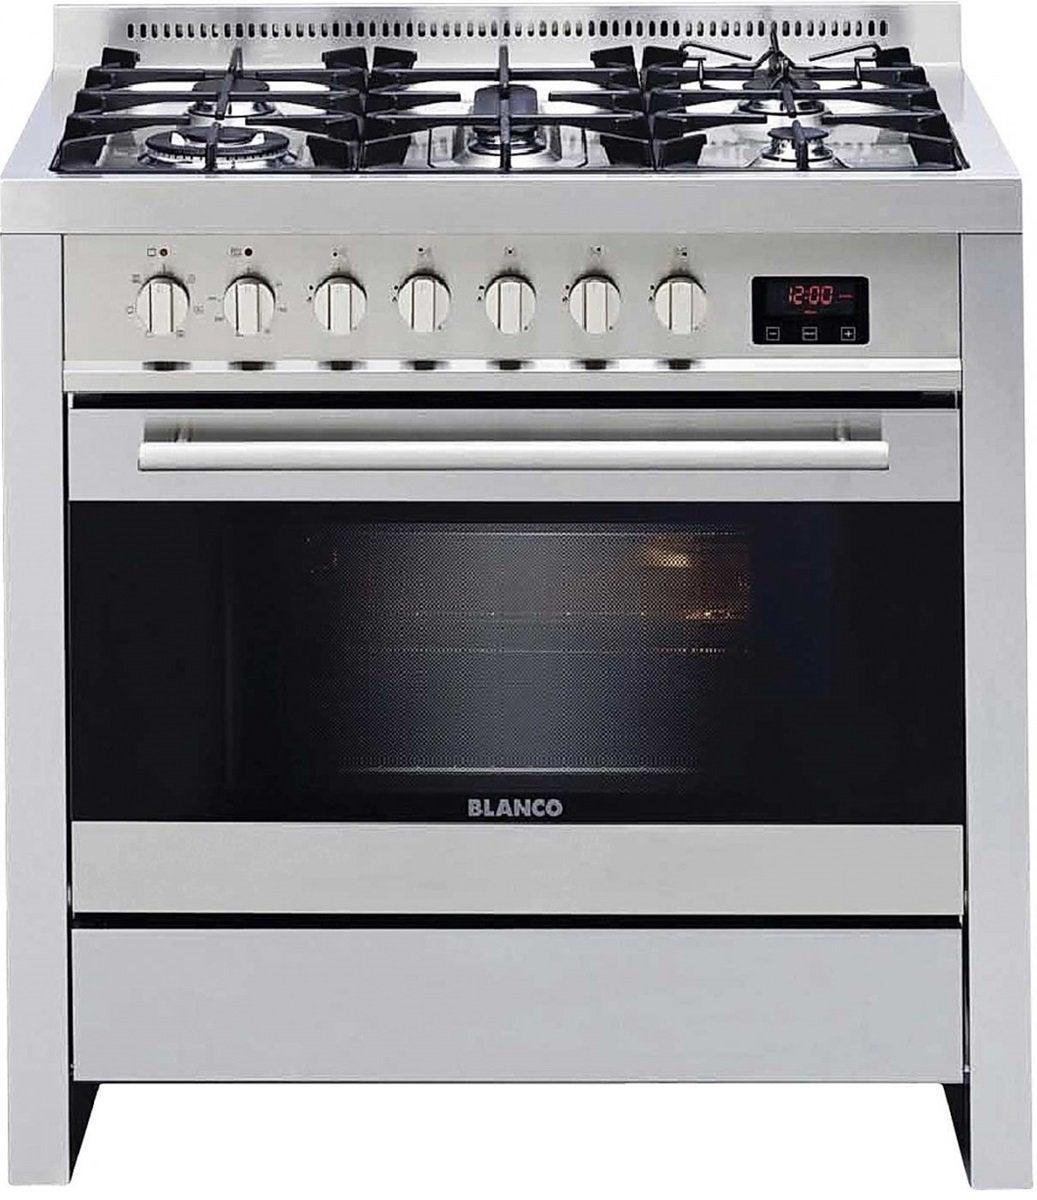 Blanco FD6064WX Oven